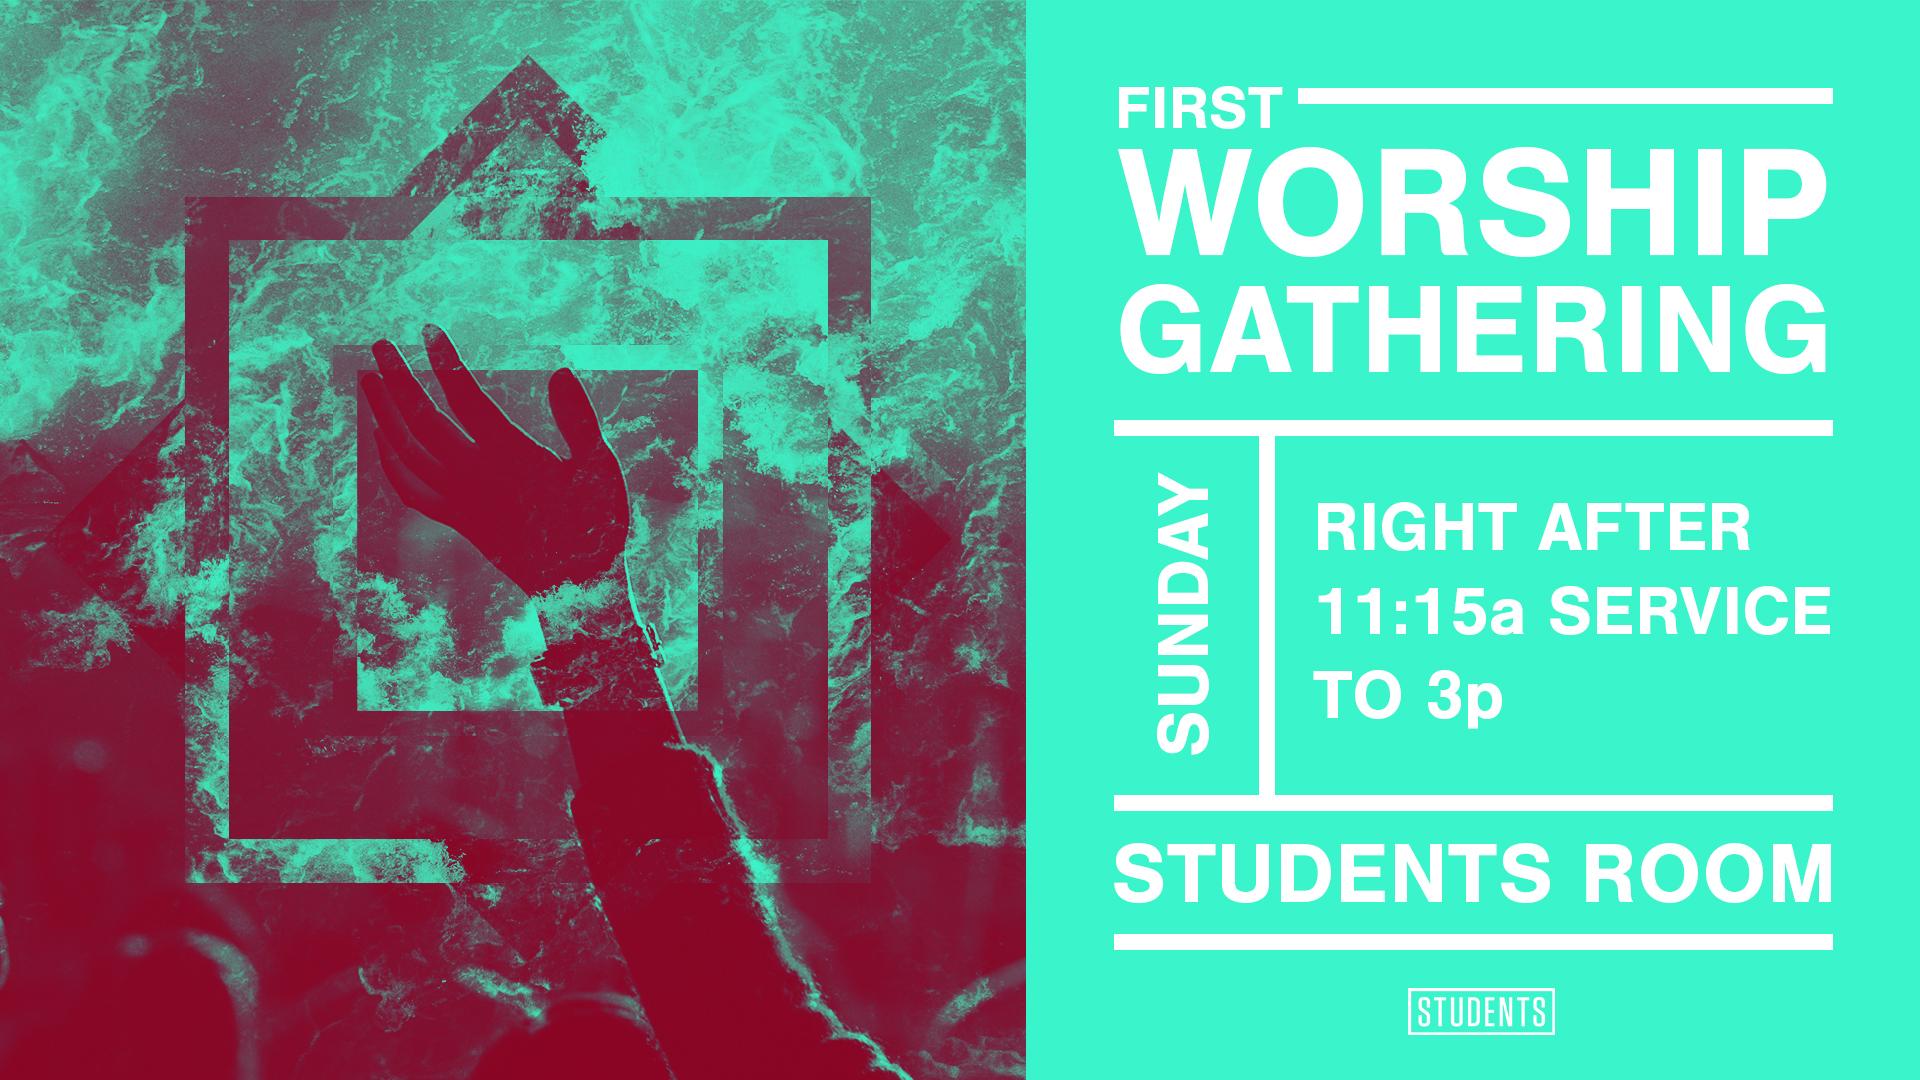 08-28-NORTH-STUDENTS-Worship-Gathering-SUNDAY.jpg